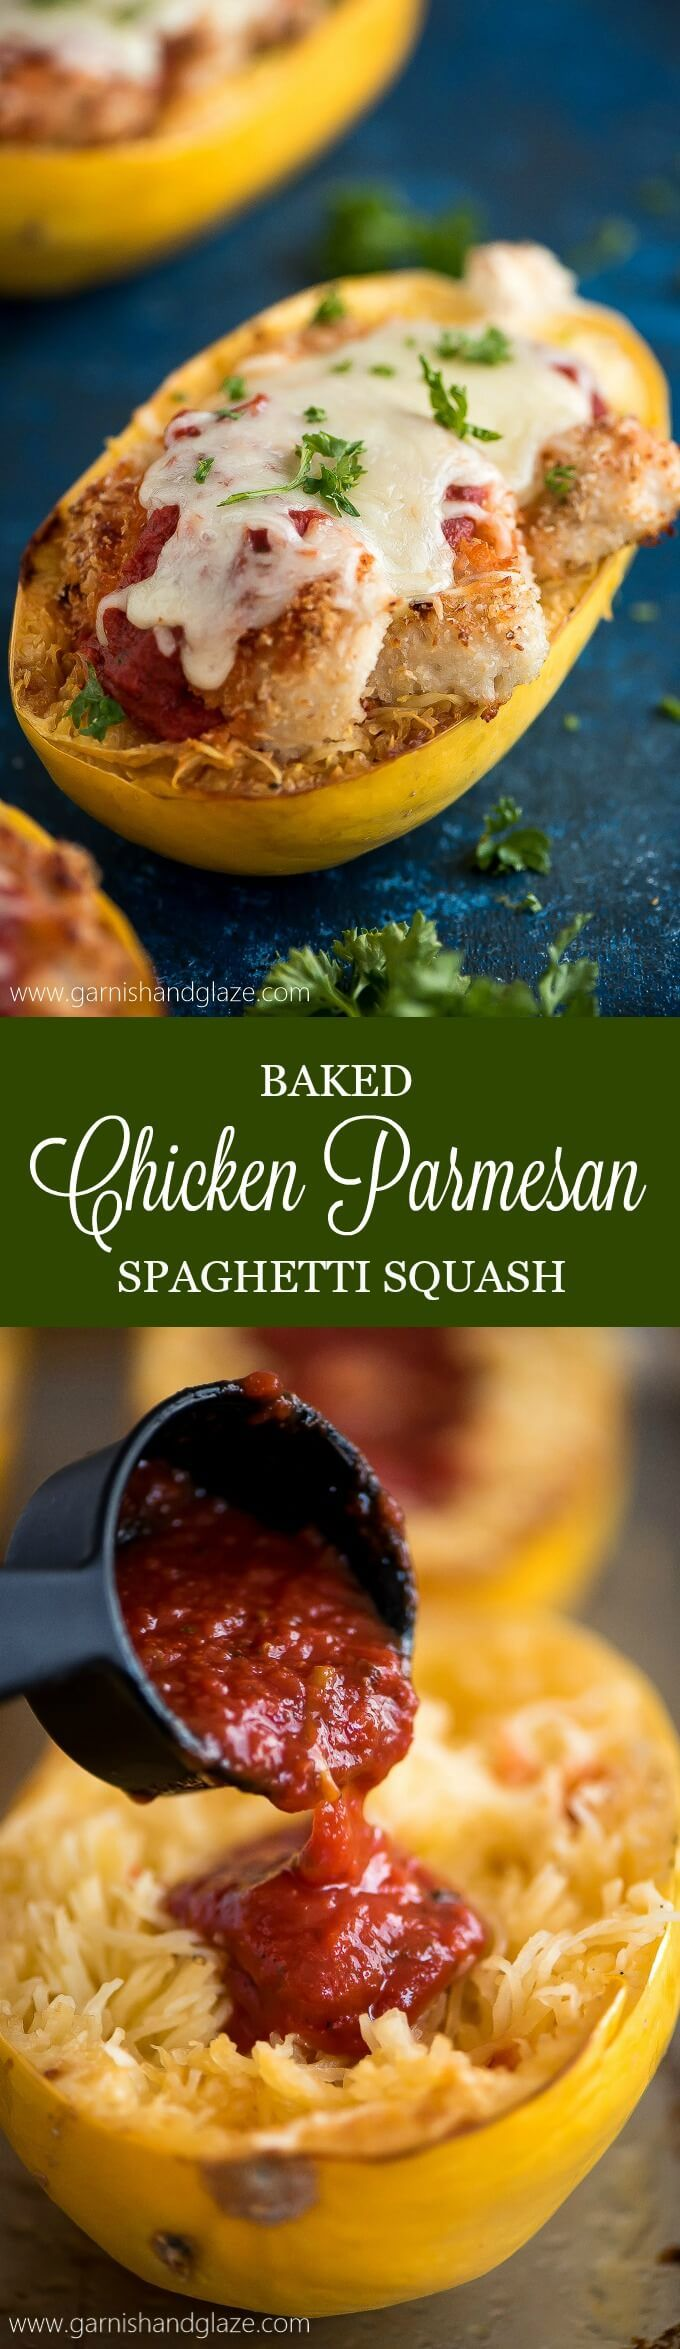 Baked Chicken Parmesan Spaghetti Squash